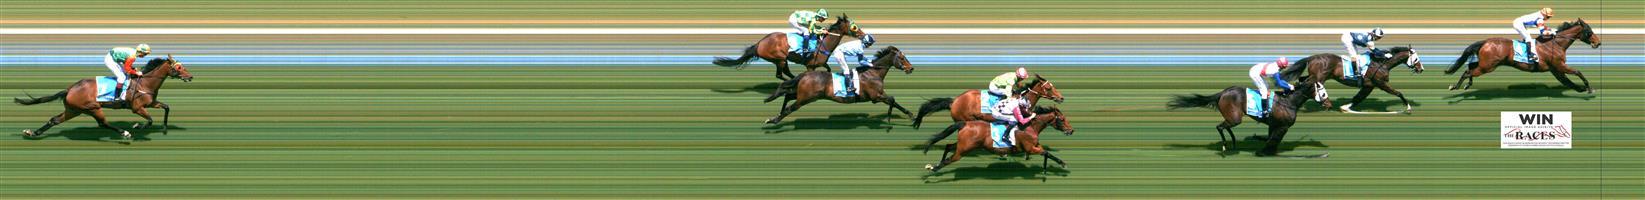 ↗️Morphettville Race 3 No.8 Pelonomena @ $8 (0.72 UNIT WIN) (watch price)   Result : Non Qualifier - Unplaced at SP $17.00